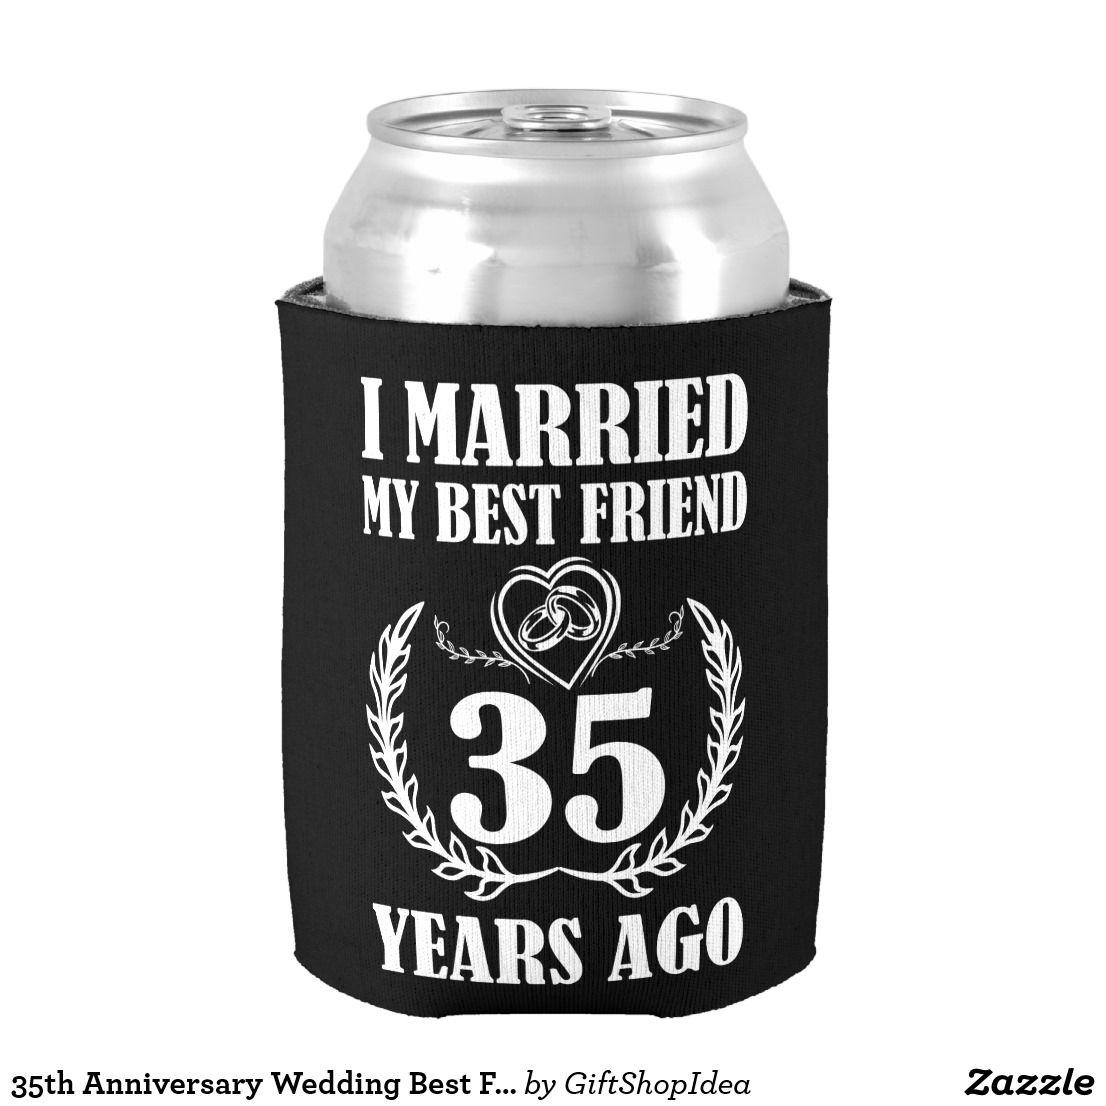 Wedding Venues Near Me Cheap: 35th Anniversary Wedding Best Friend Can Cooler